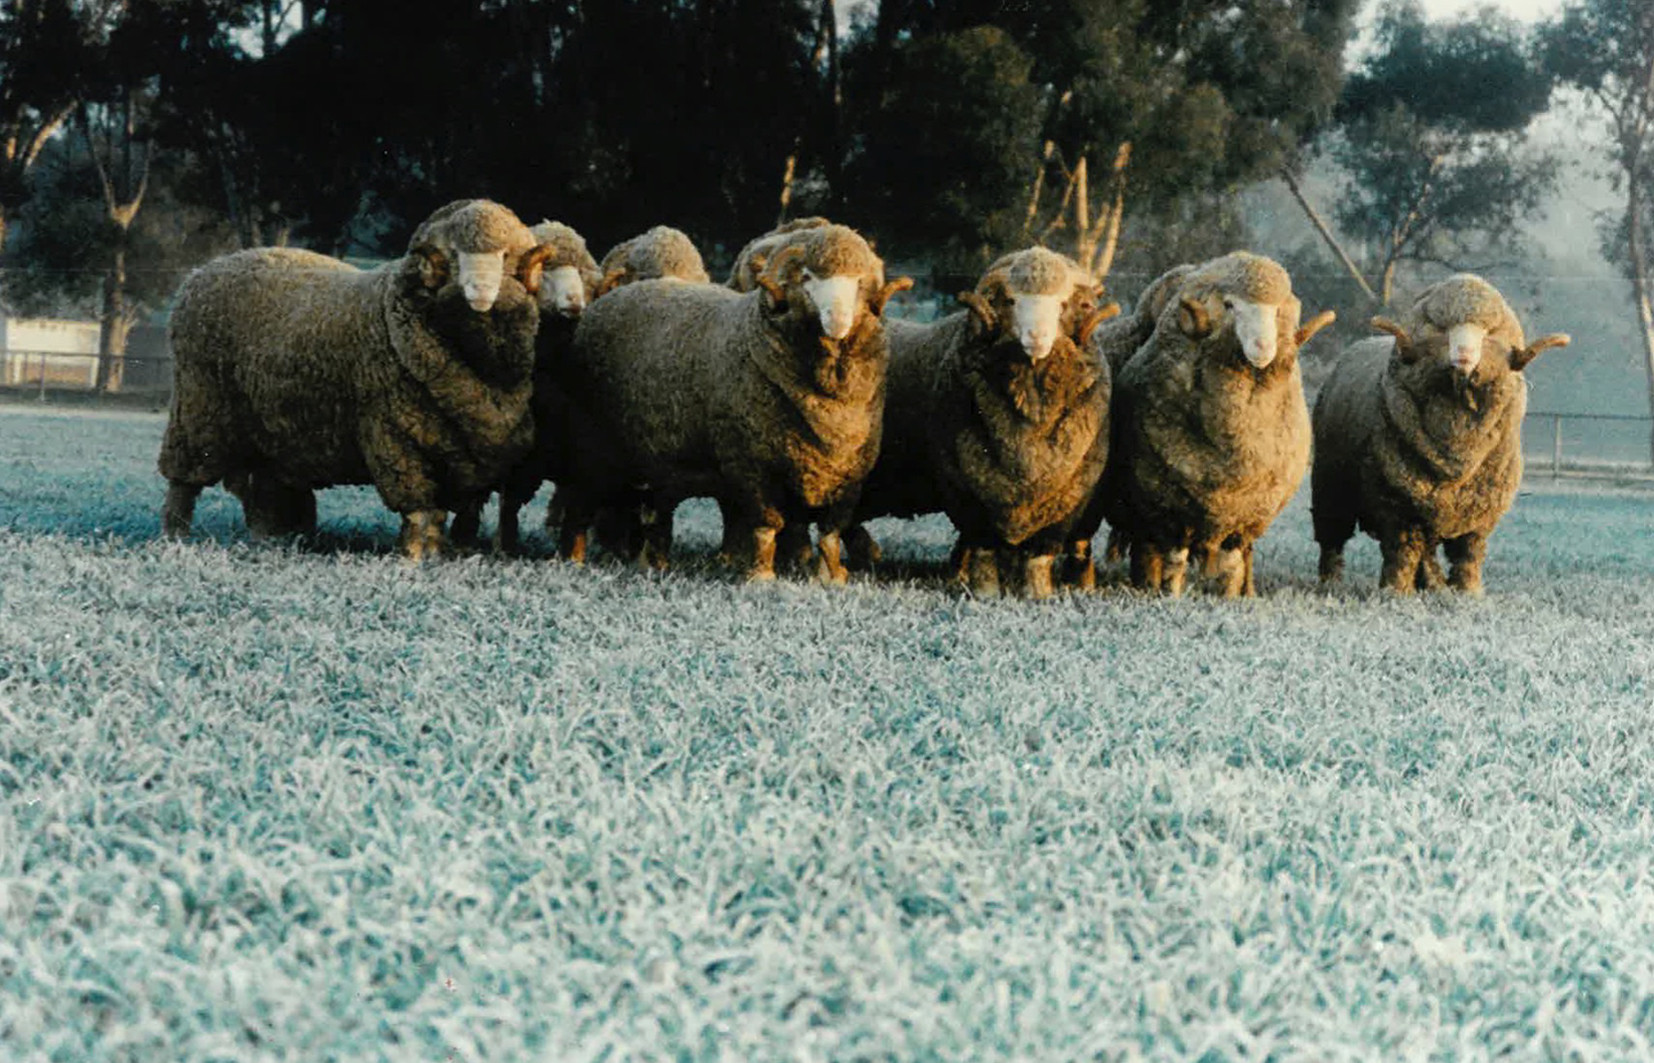 Sheep_Slider 3.jpg